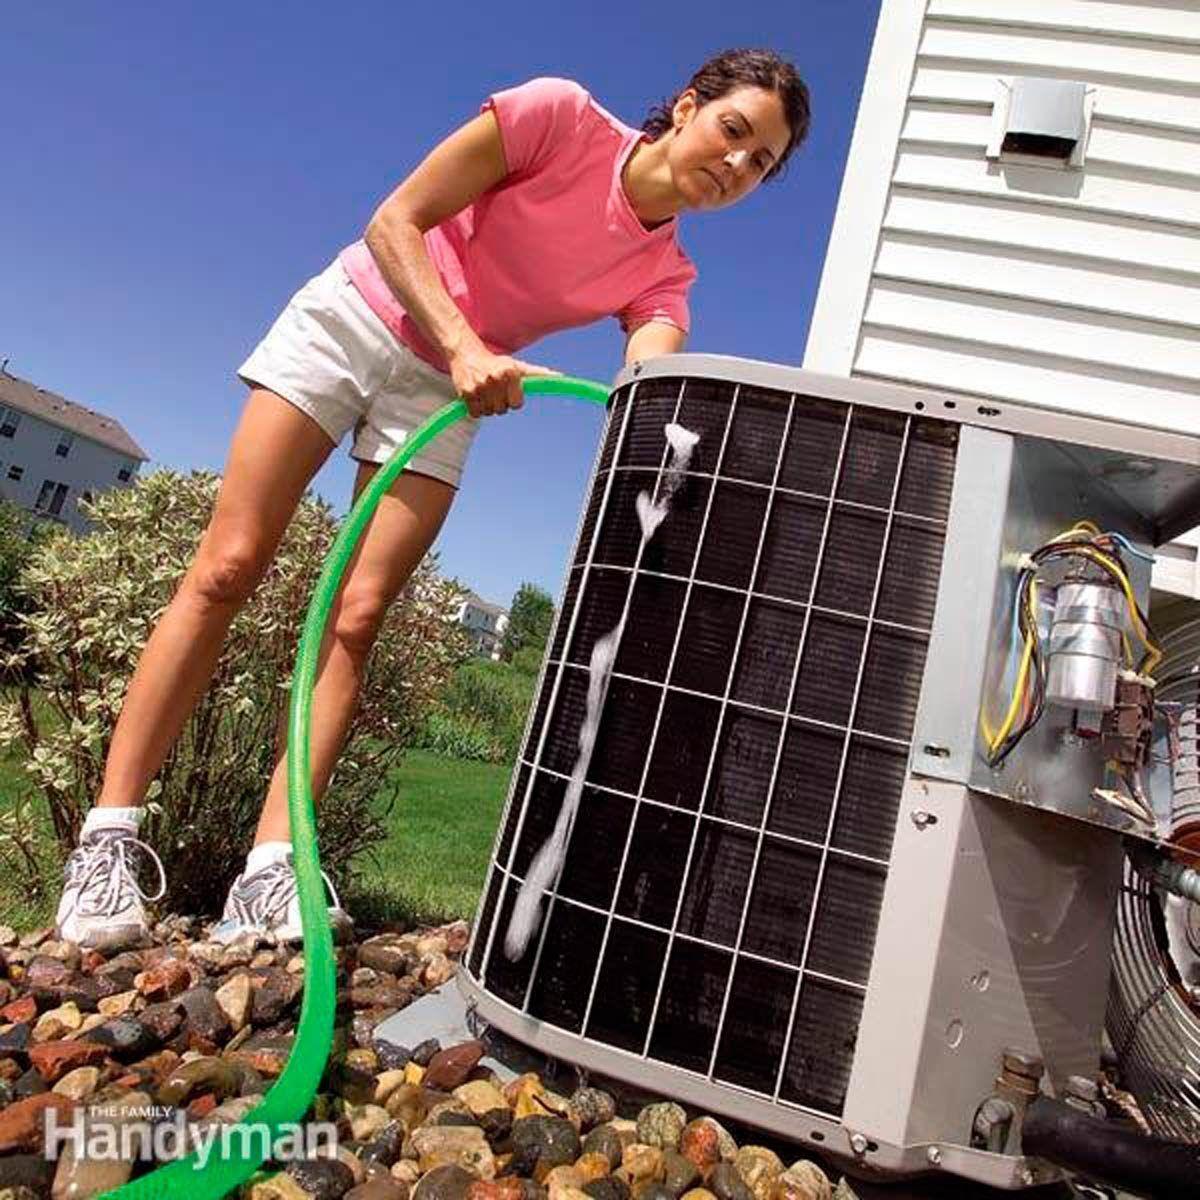 How To Clean An Ac Condenser In 2020 Air Conditioner Maintenance Clean Air Conditioner Central Air Conditioners